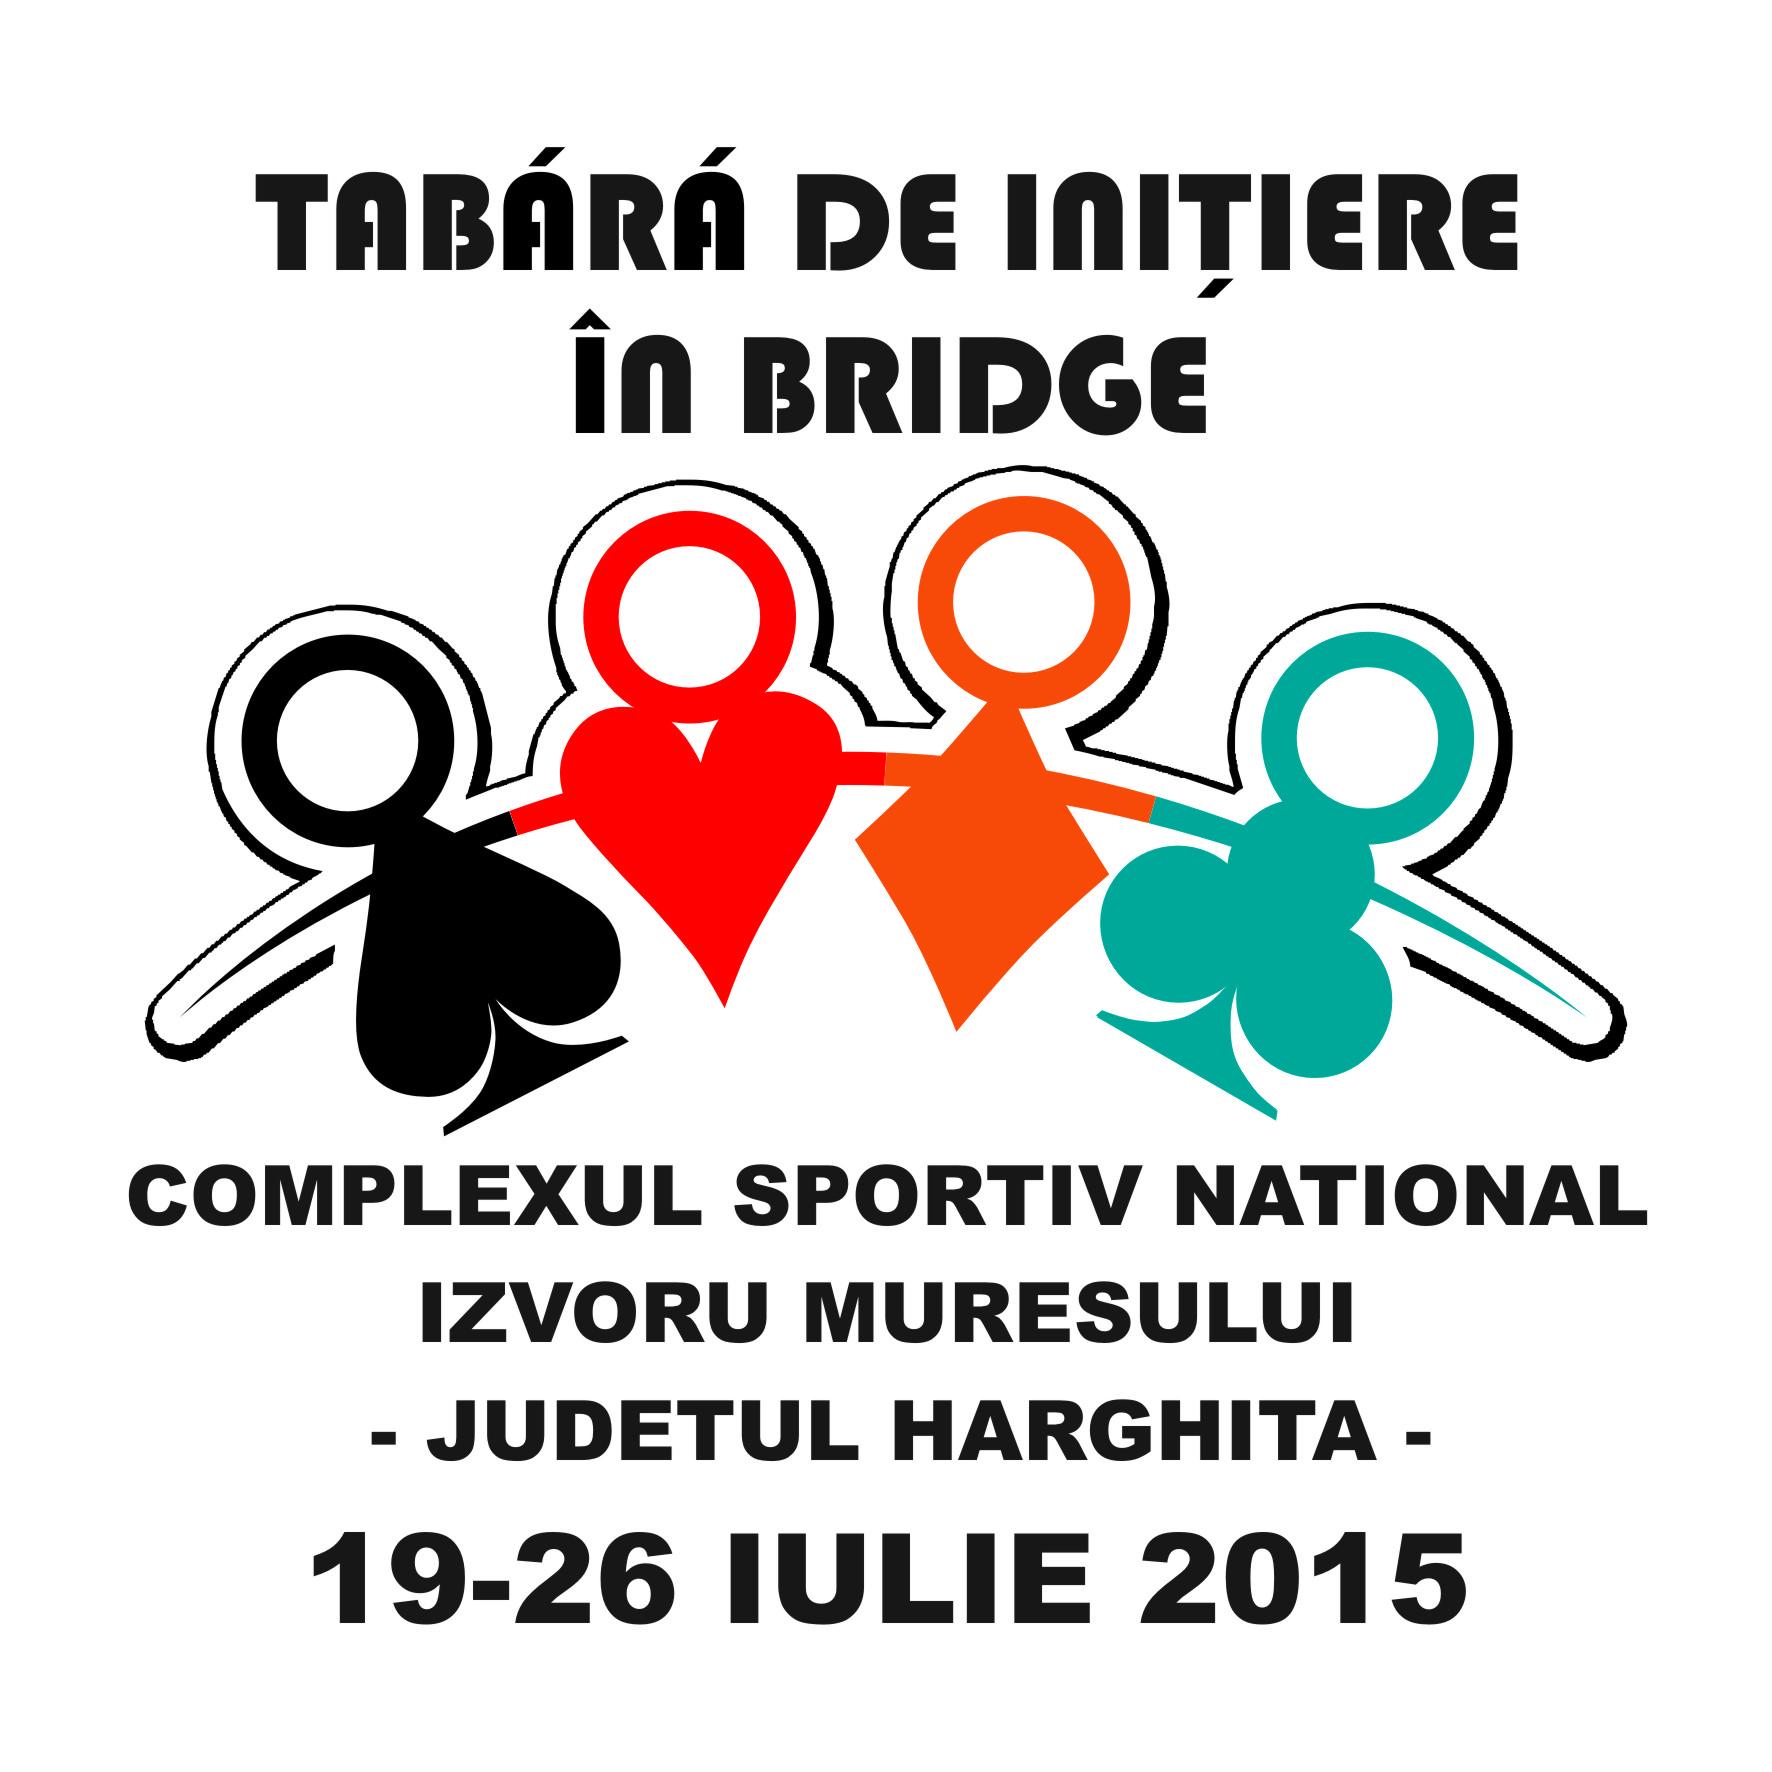 Tabara de bridge 2015